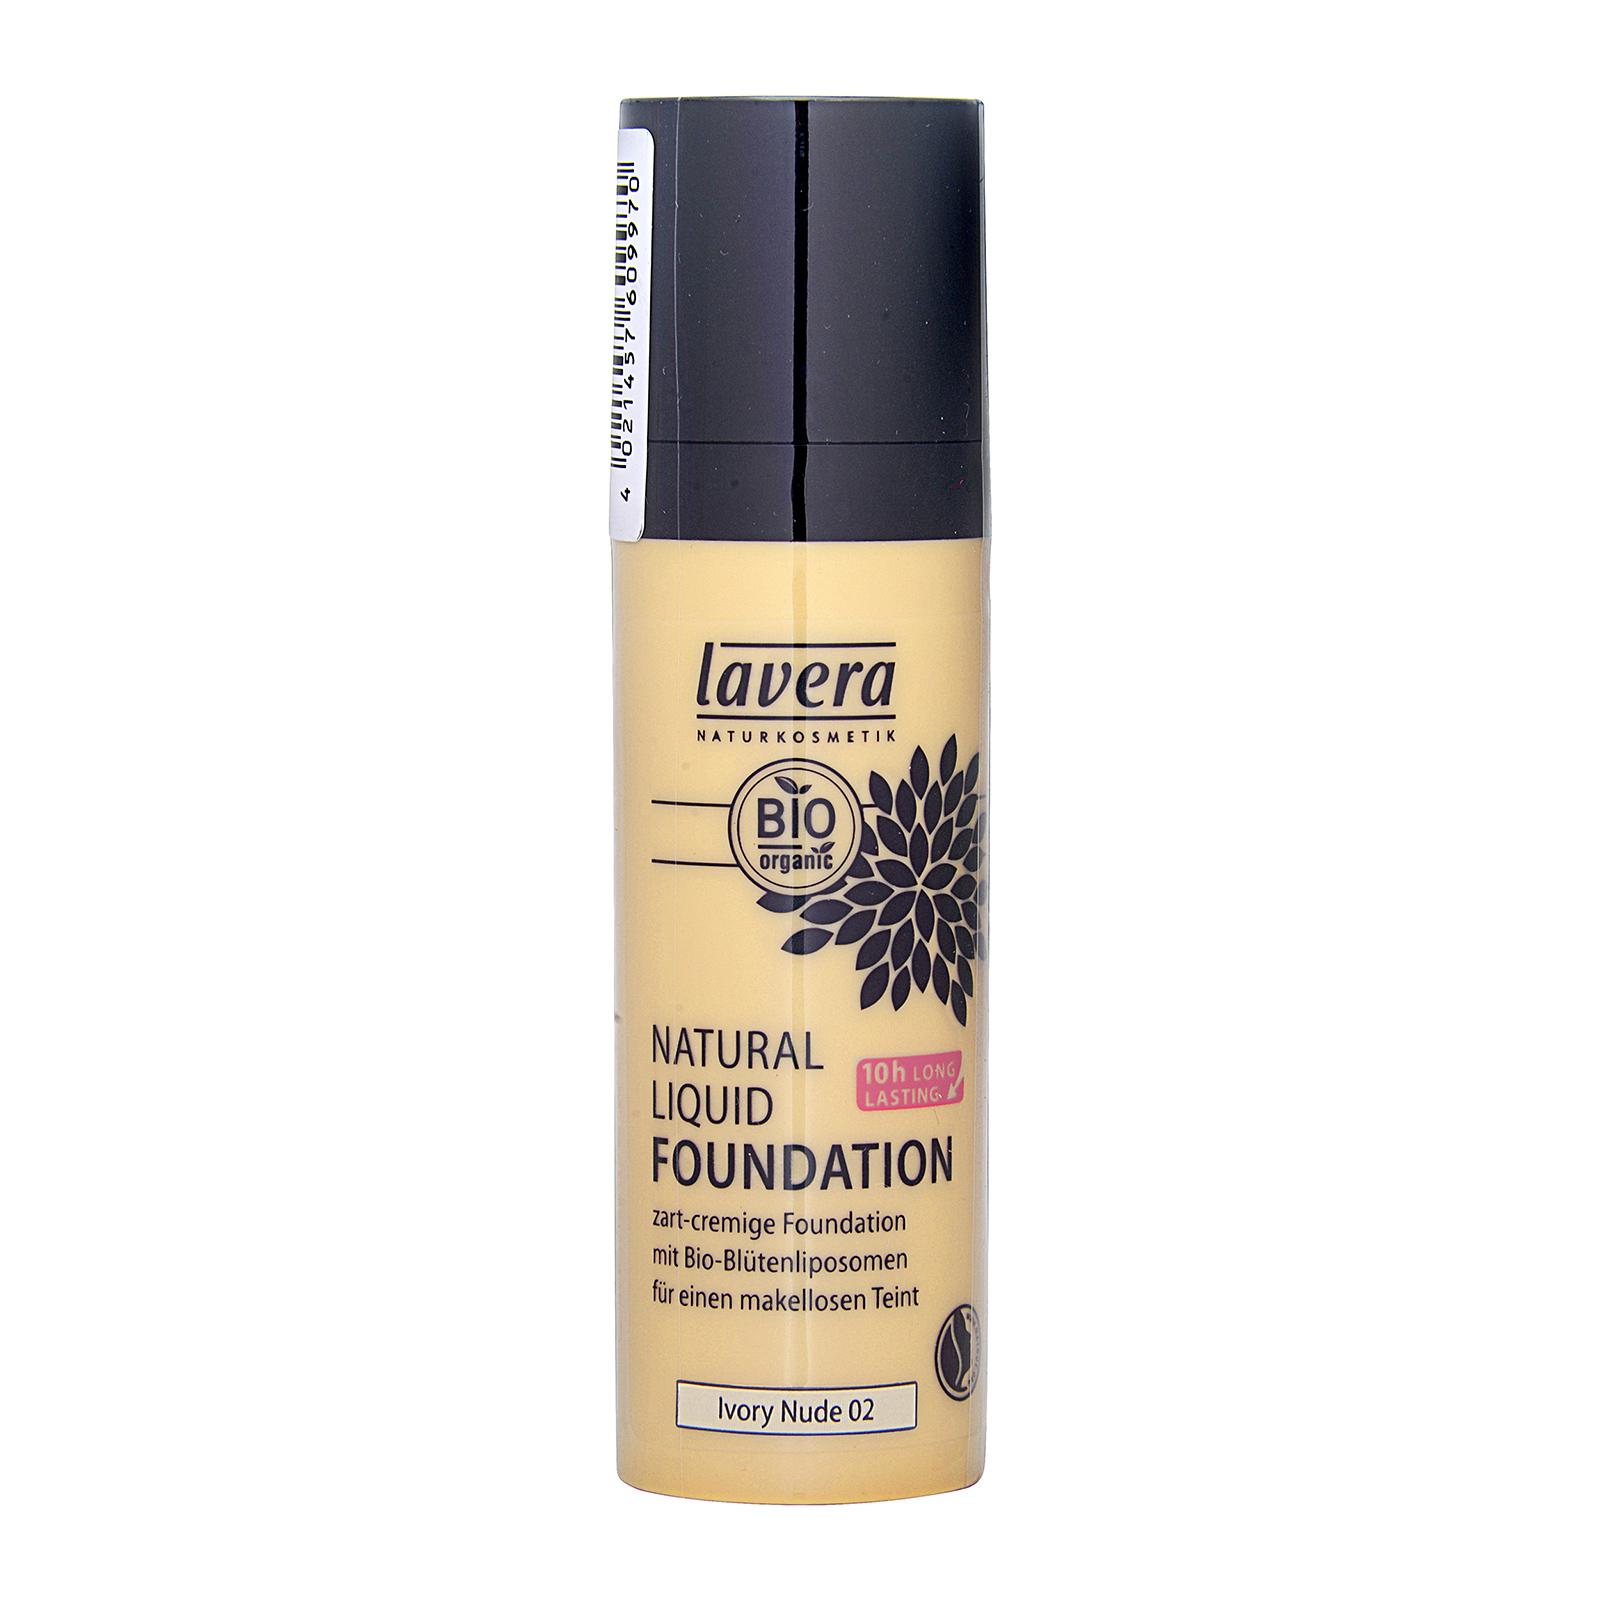 Lavera  Natural Liquid Foundation Lvory Nude 02, 30ml, LVX0100188-002-00